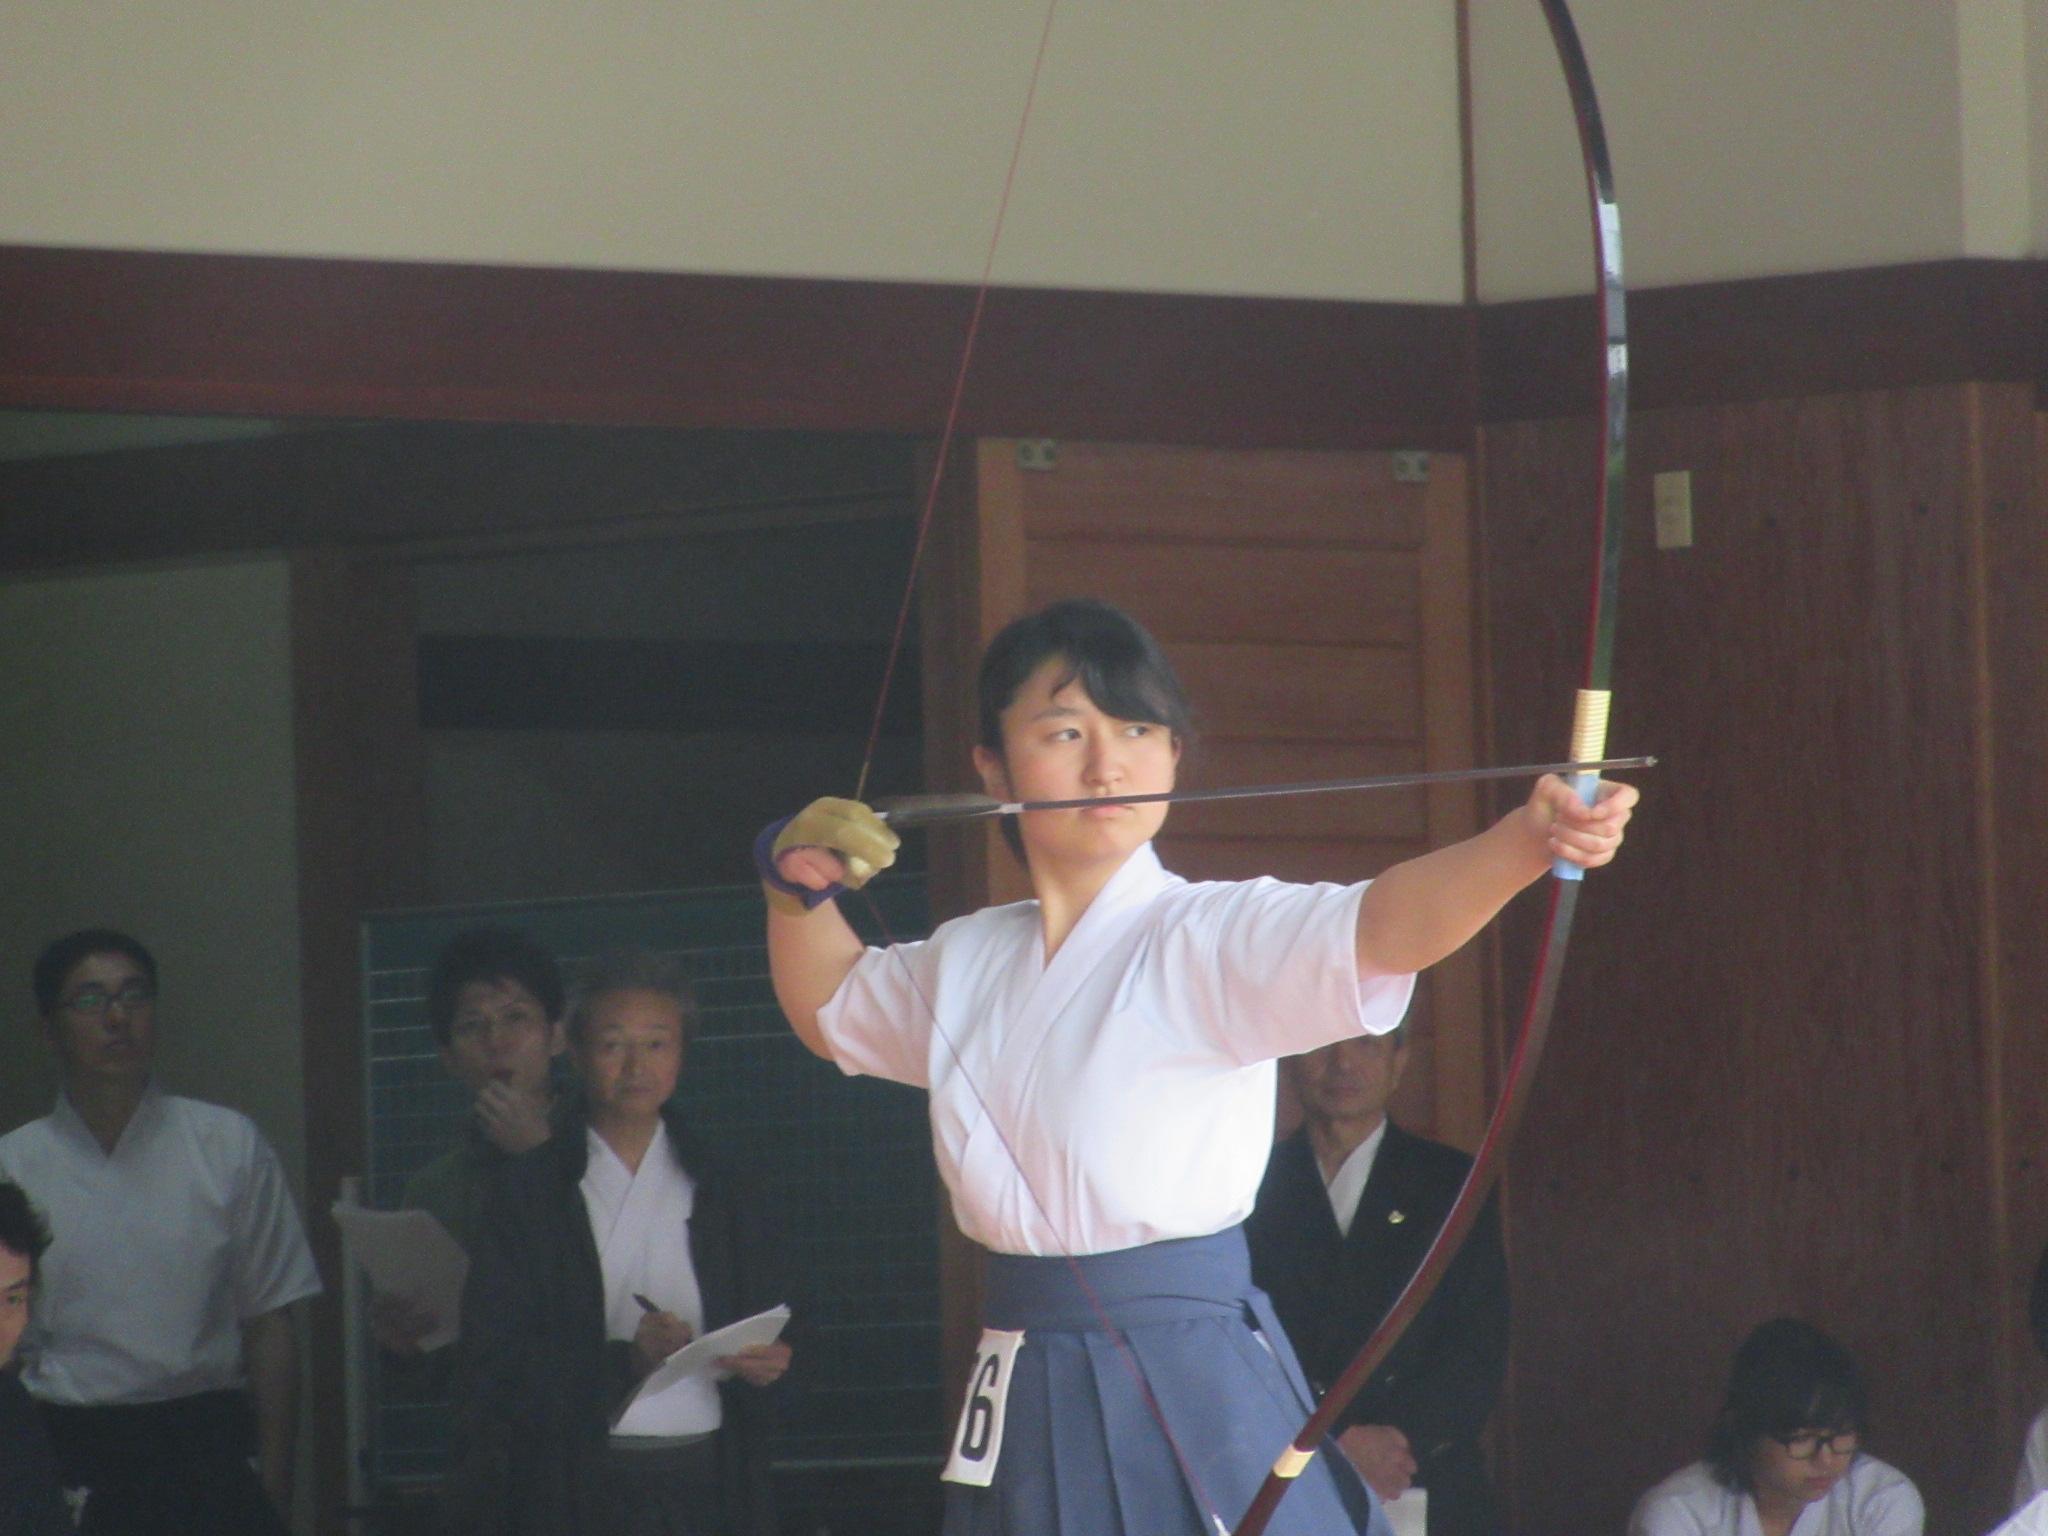 岡田那(2)射詰め八寸3本目敗退 3位4位決定遠近競射で大学女子の部4位